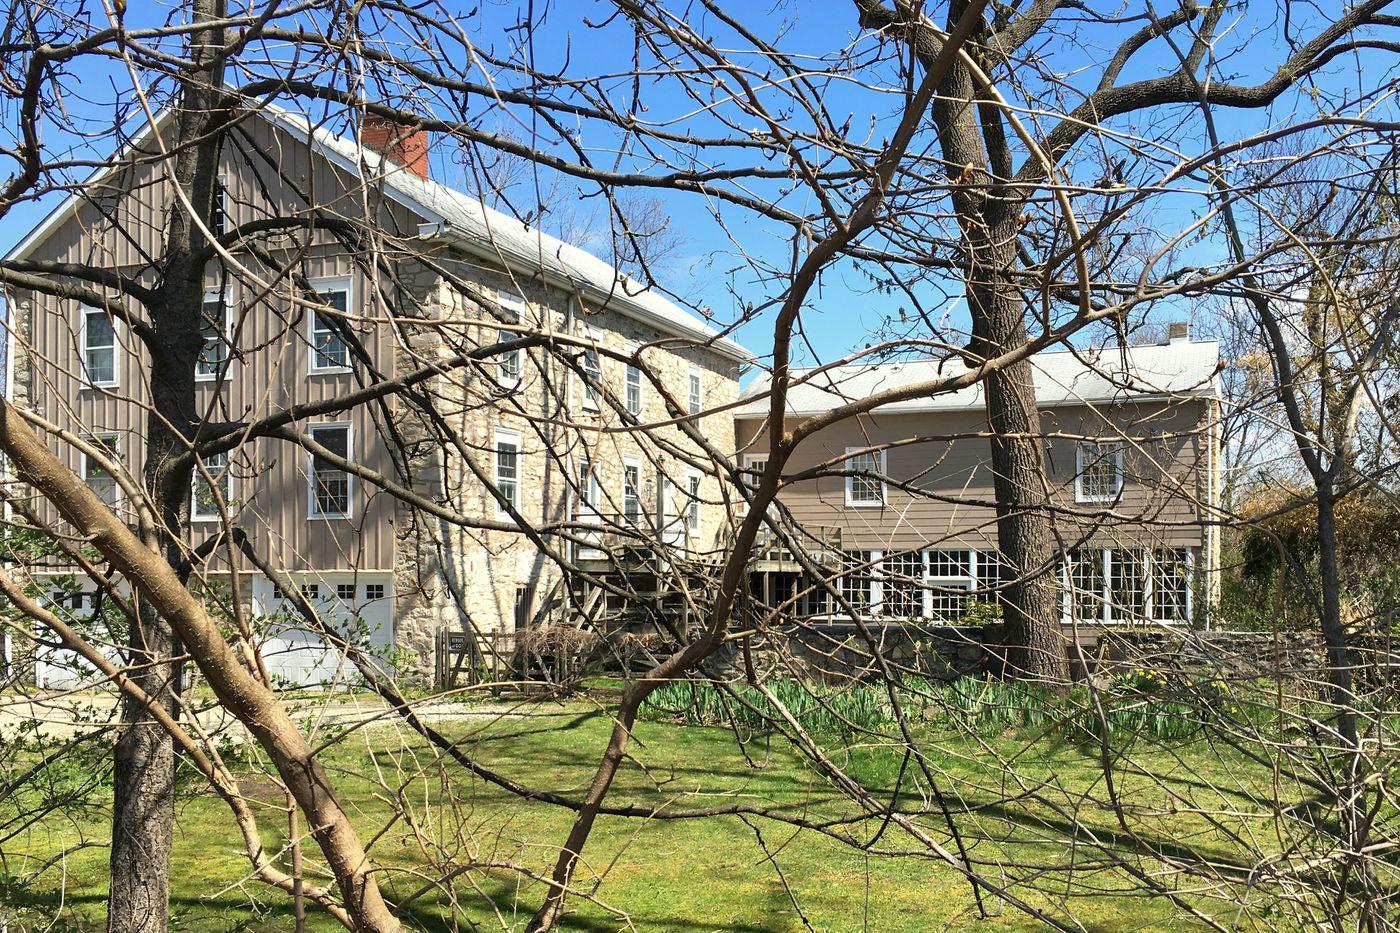 Whitemarsh developer on Abolition Hall: We listened | Opinion